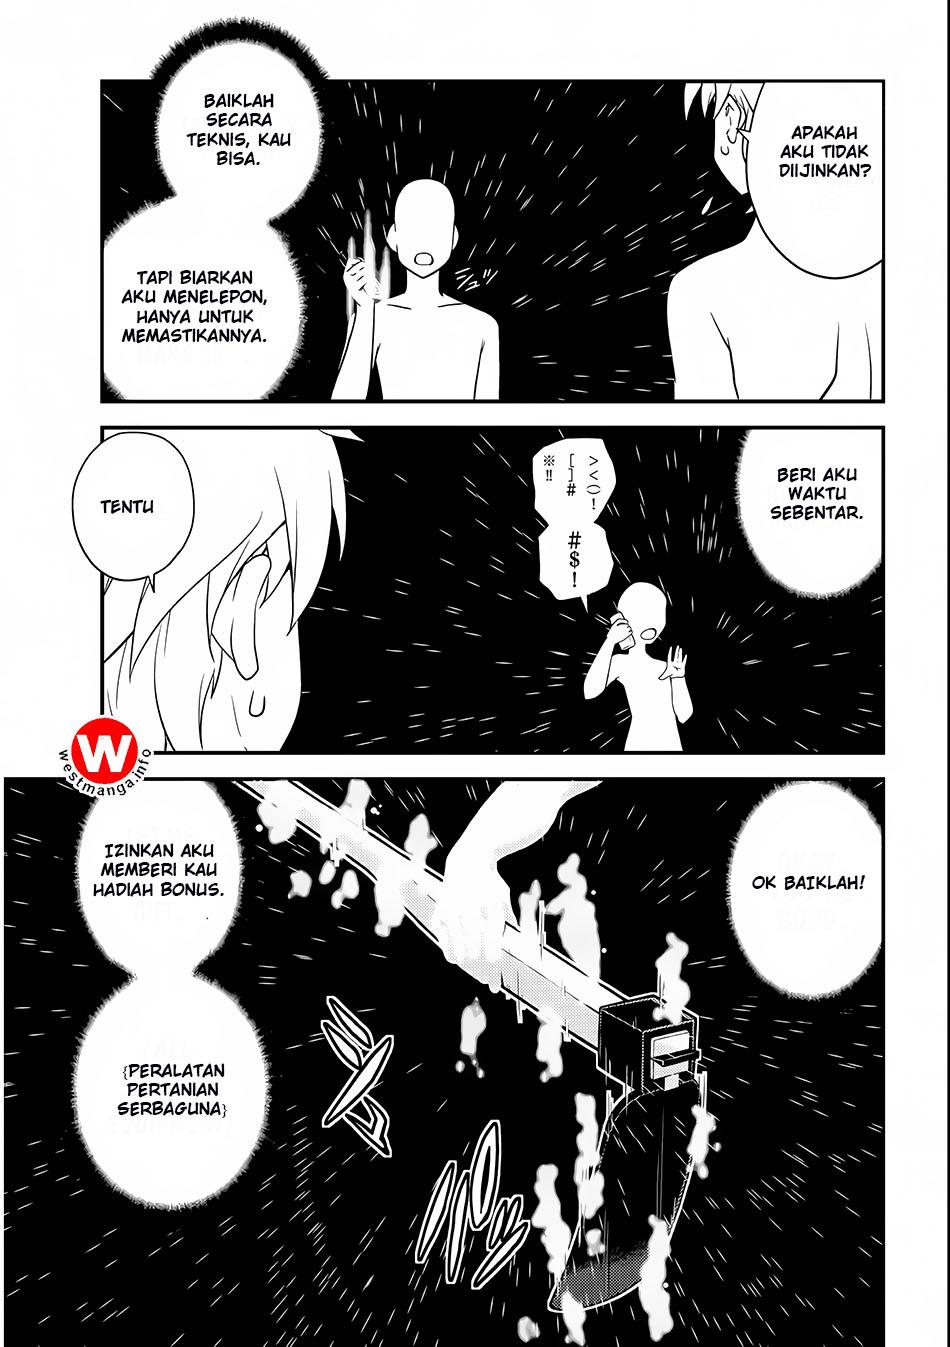 Komik isekai nonbiri nouka 001 - chapter 1 2 Indonesia isekai nonbiri nouka 001 - chapter 1 Terbaru 16|Baca Manga Komik Indonesia